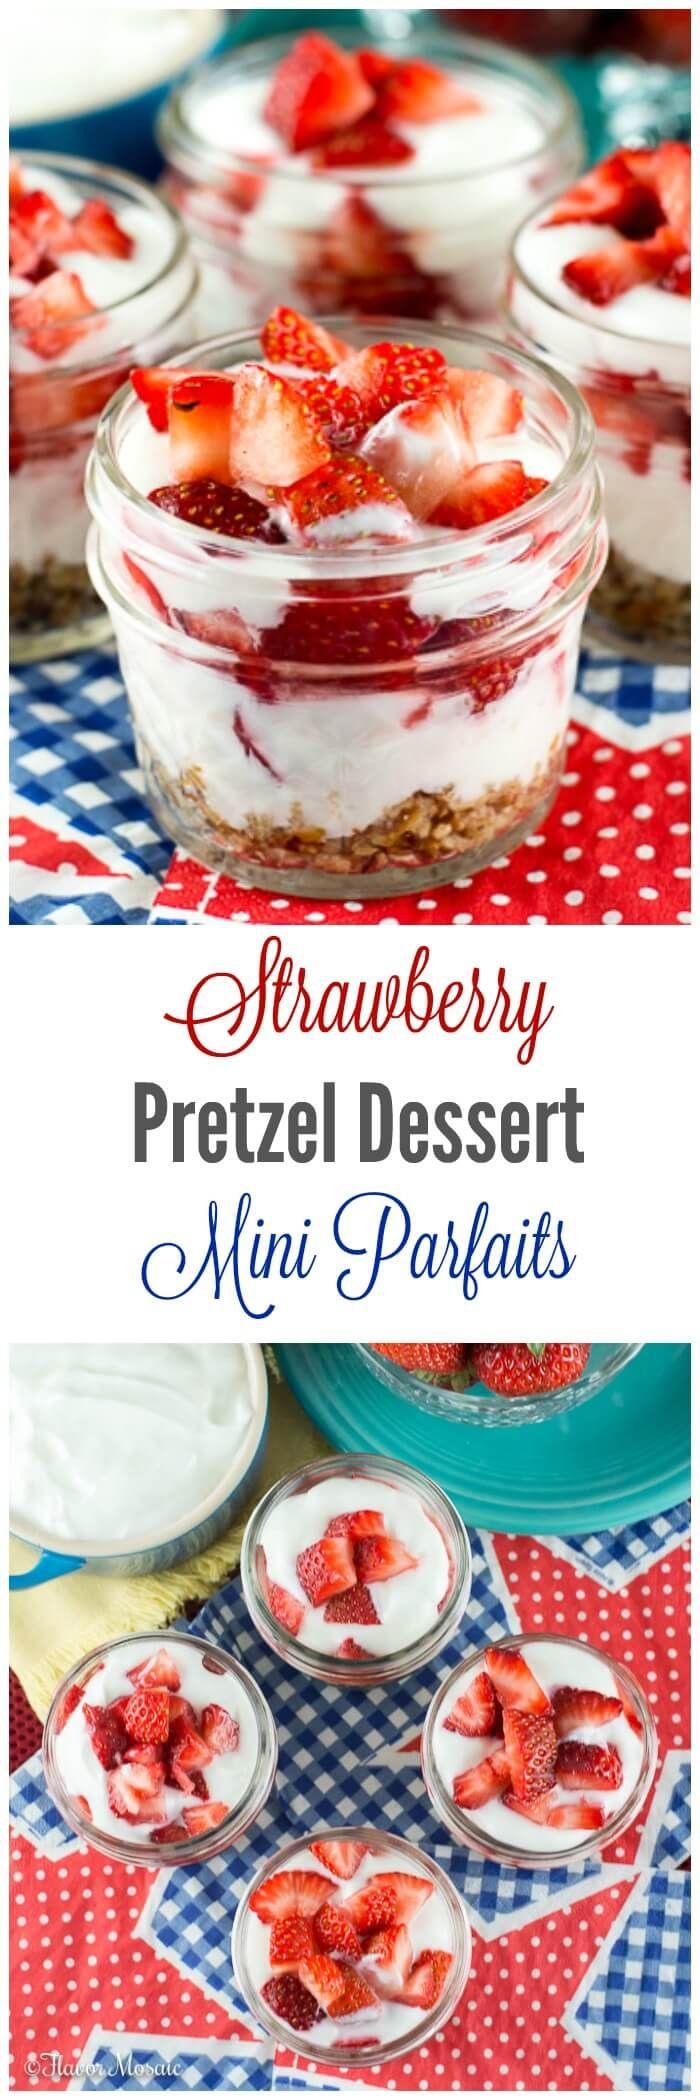 Strawberry Pretzel Dessert Mini Parfaits are a lightened up version of the traditional Strawberry Pretzel Dessert, made with Greek yogurt and served in mini mason jars.